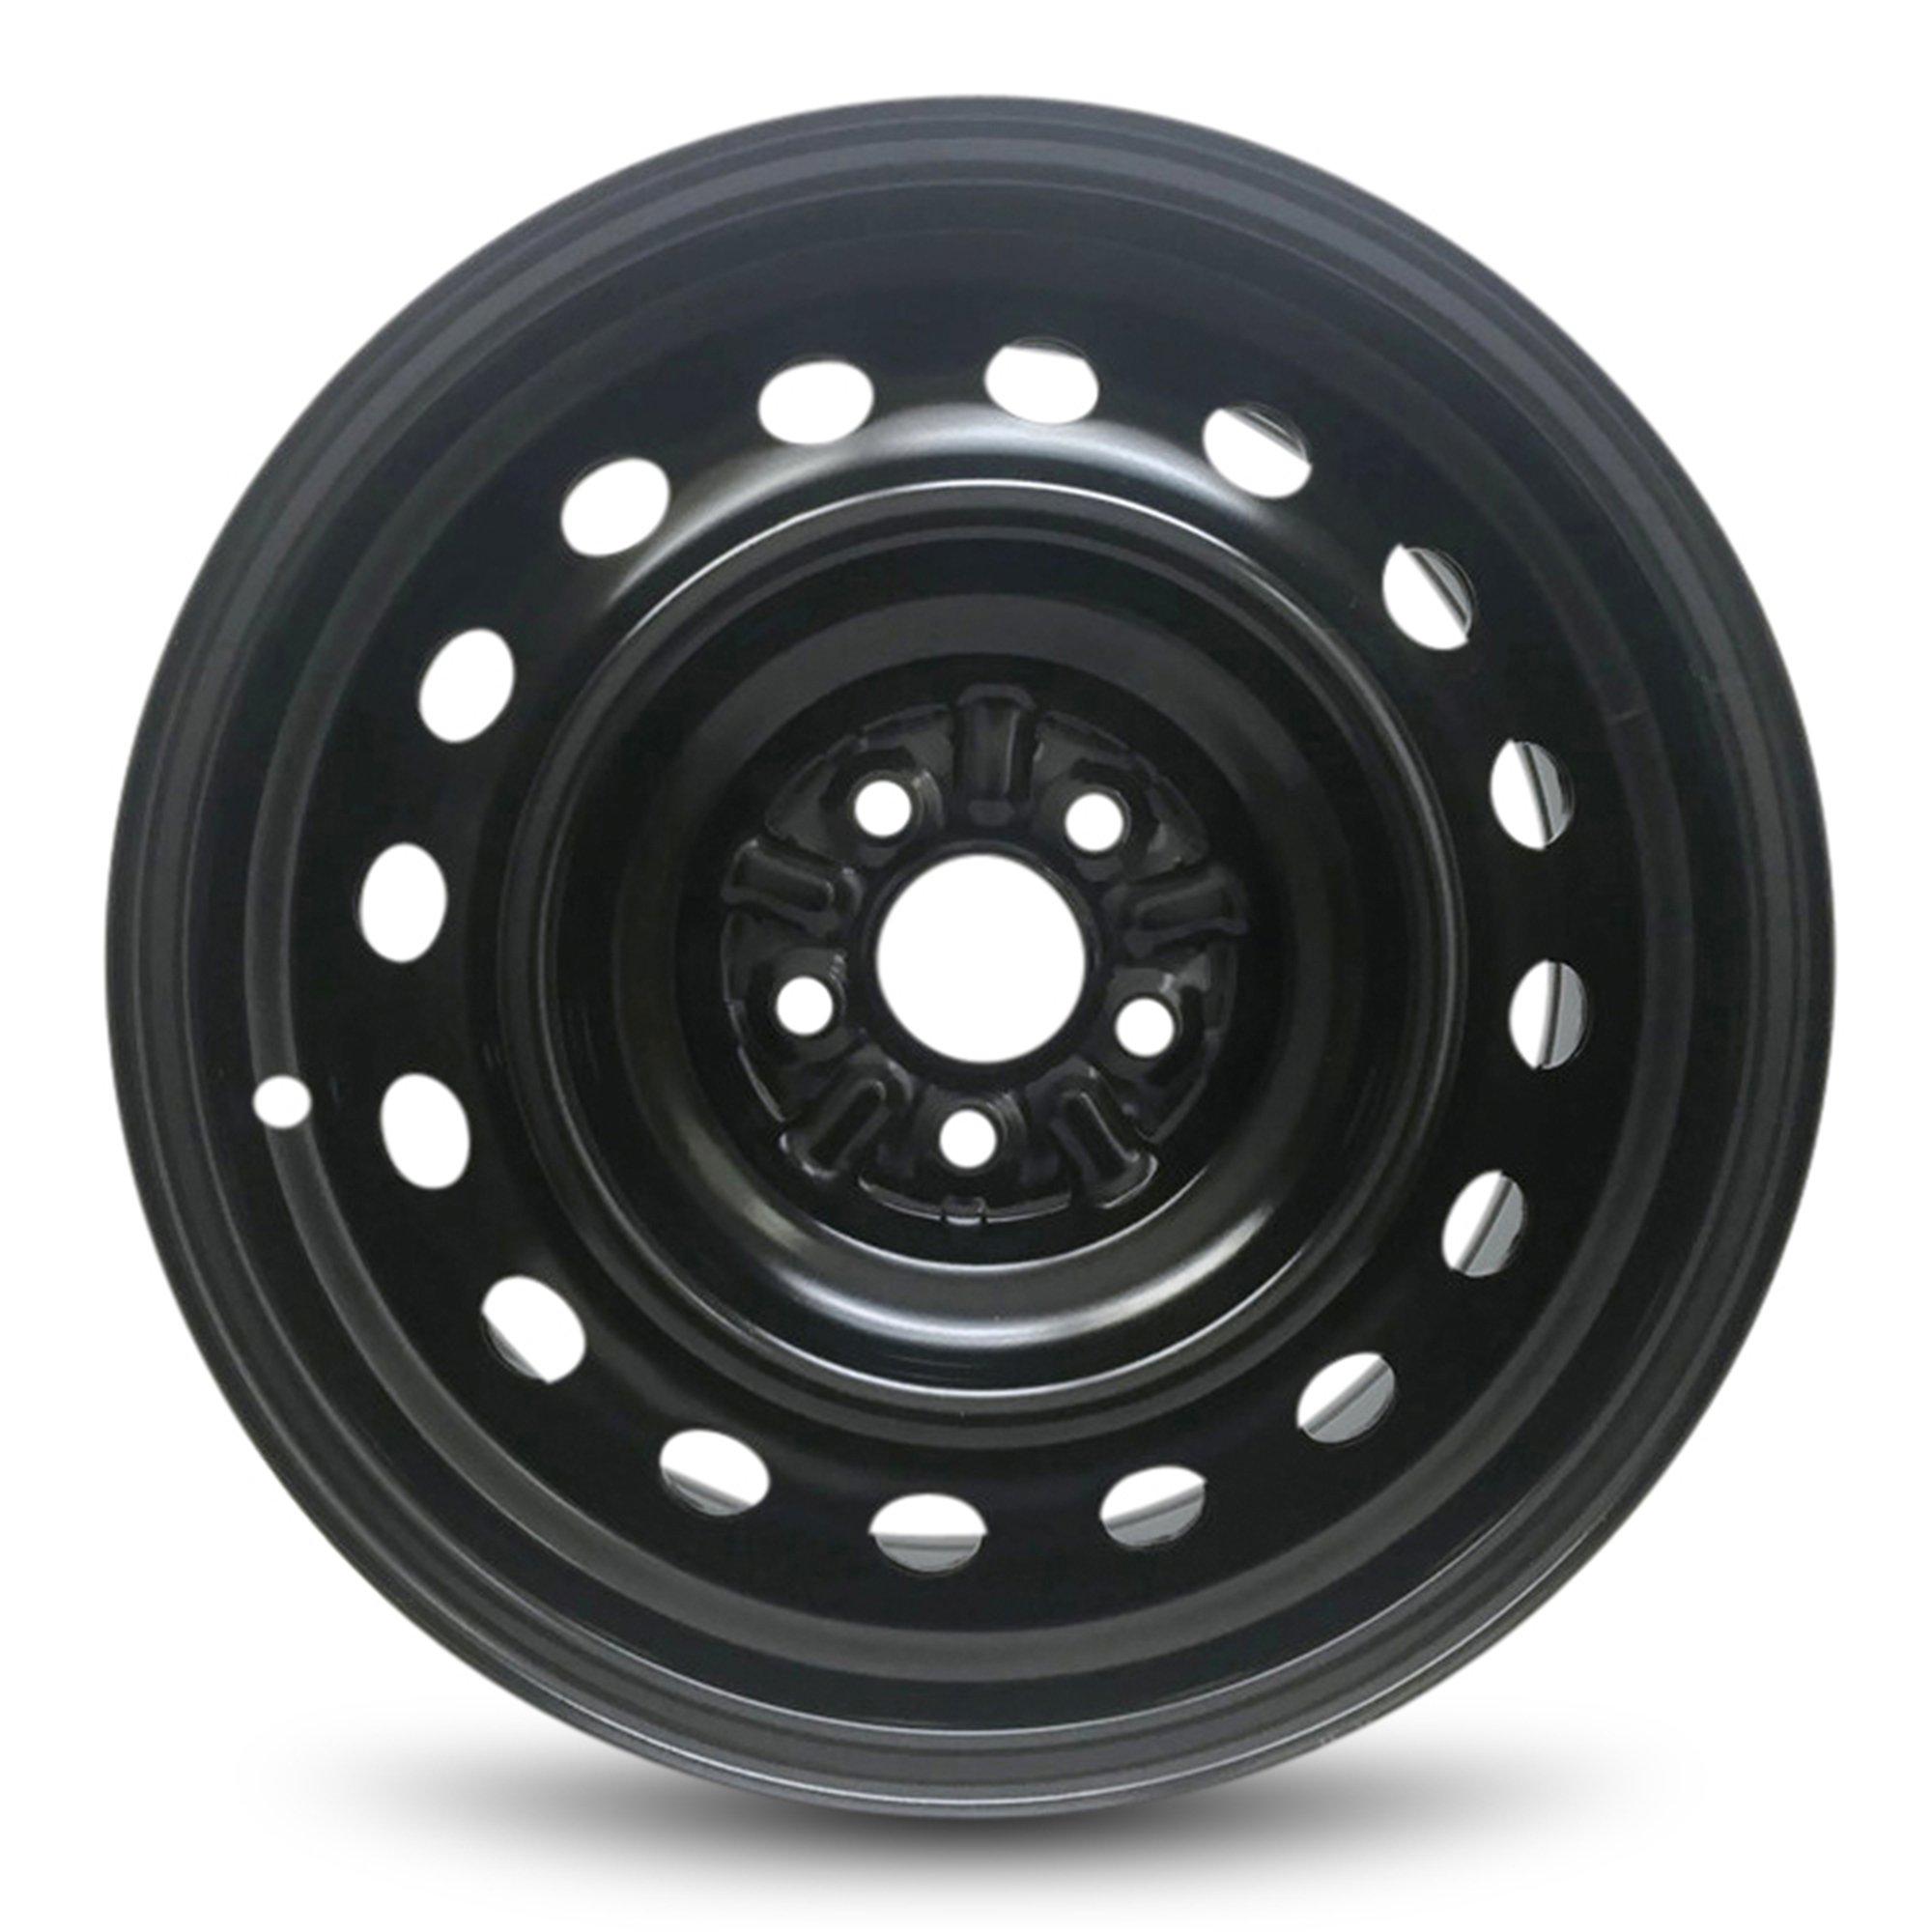 Toyota Matrix Pontiac Vibe 16 Inch 5 Lug Steel Rim/16x6.5 5-100 Steel Wheel